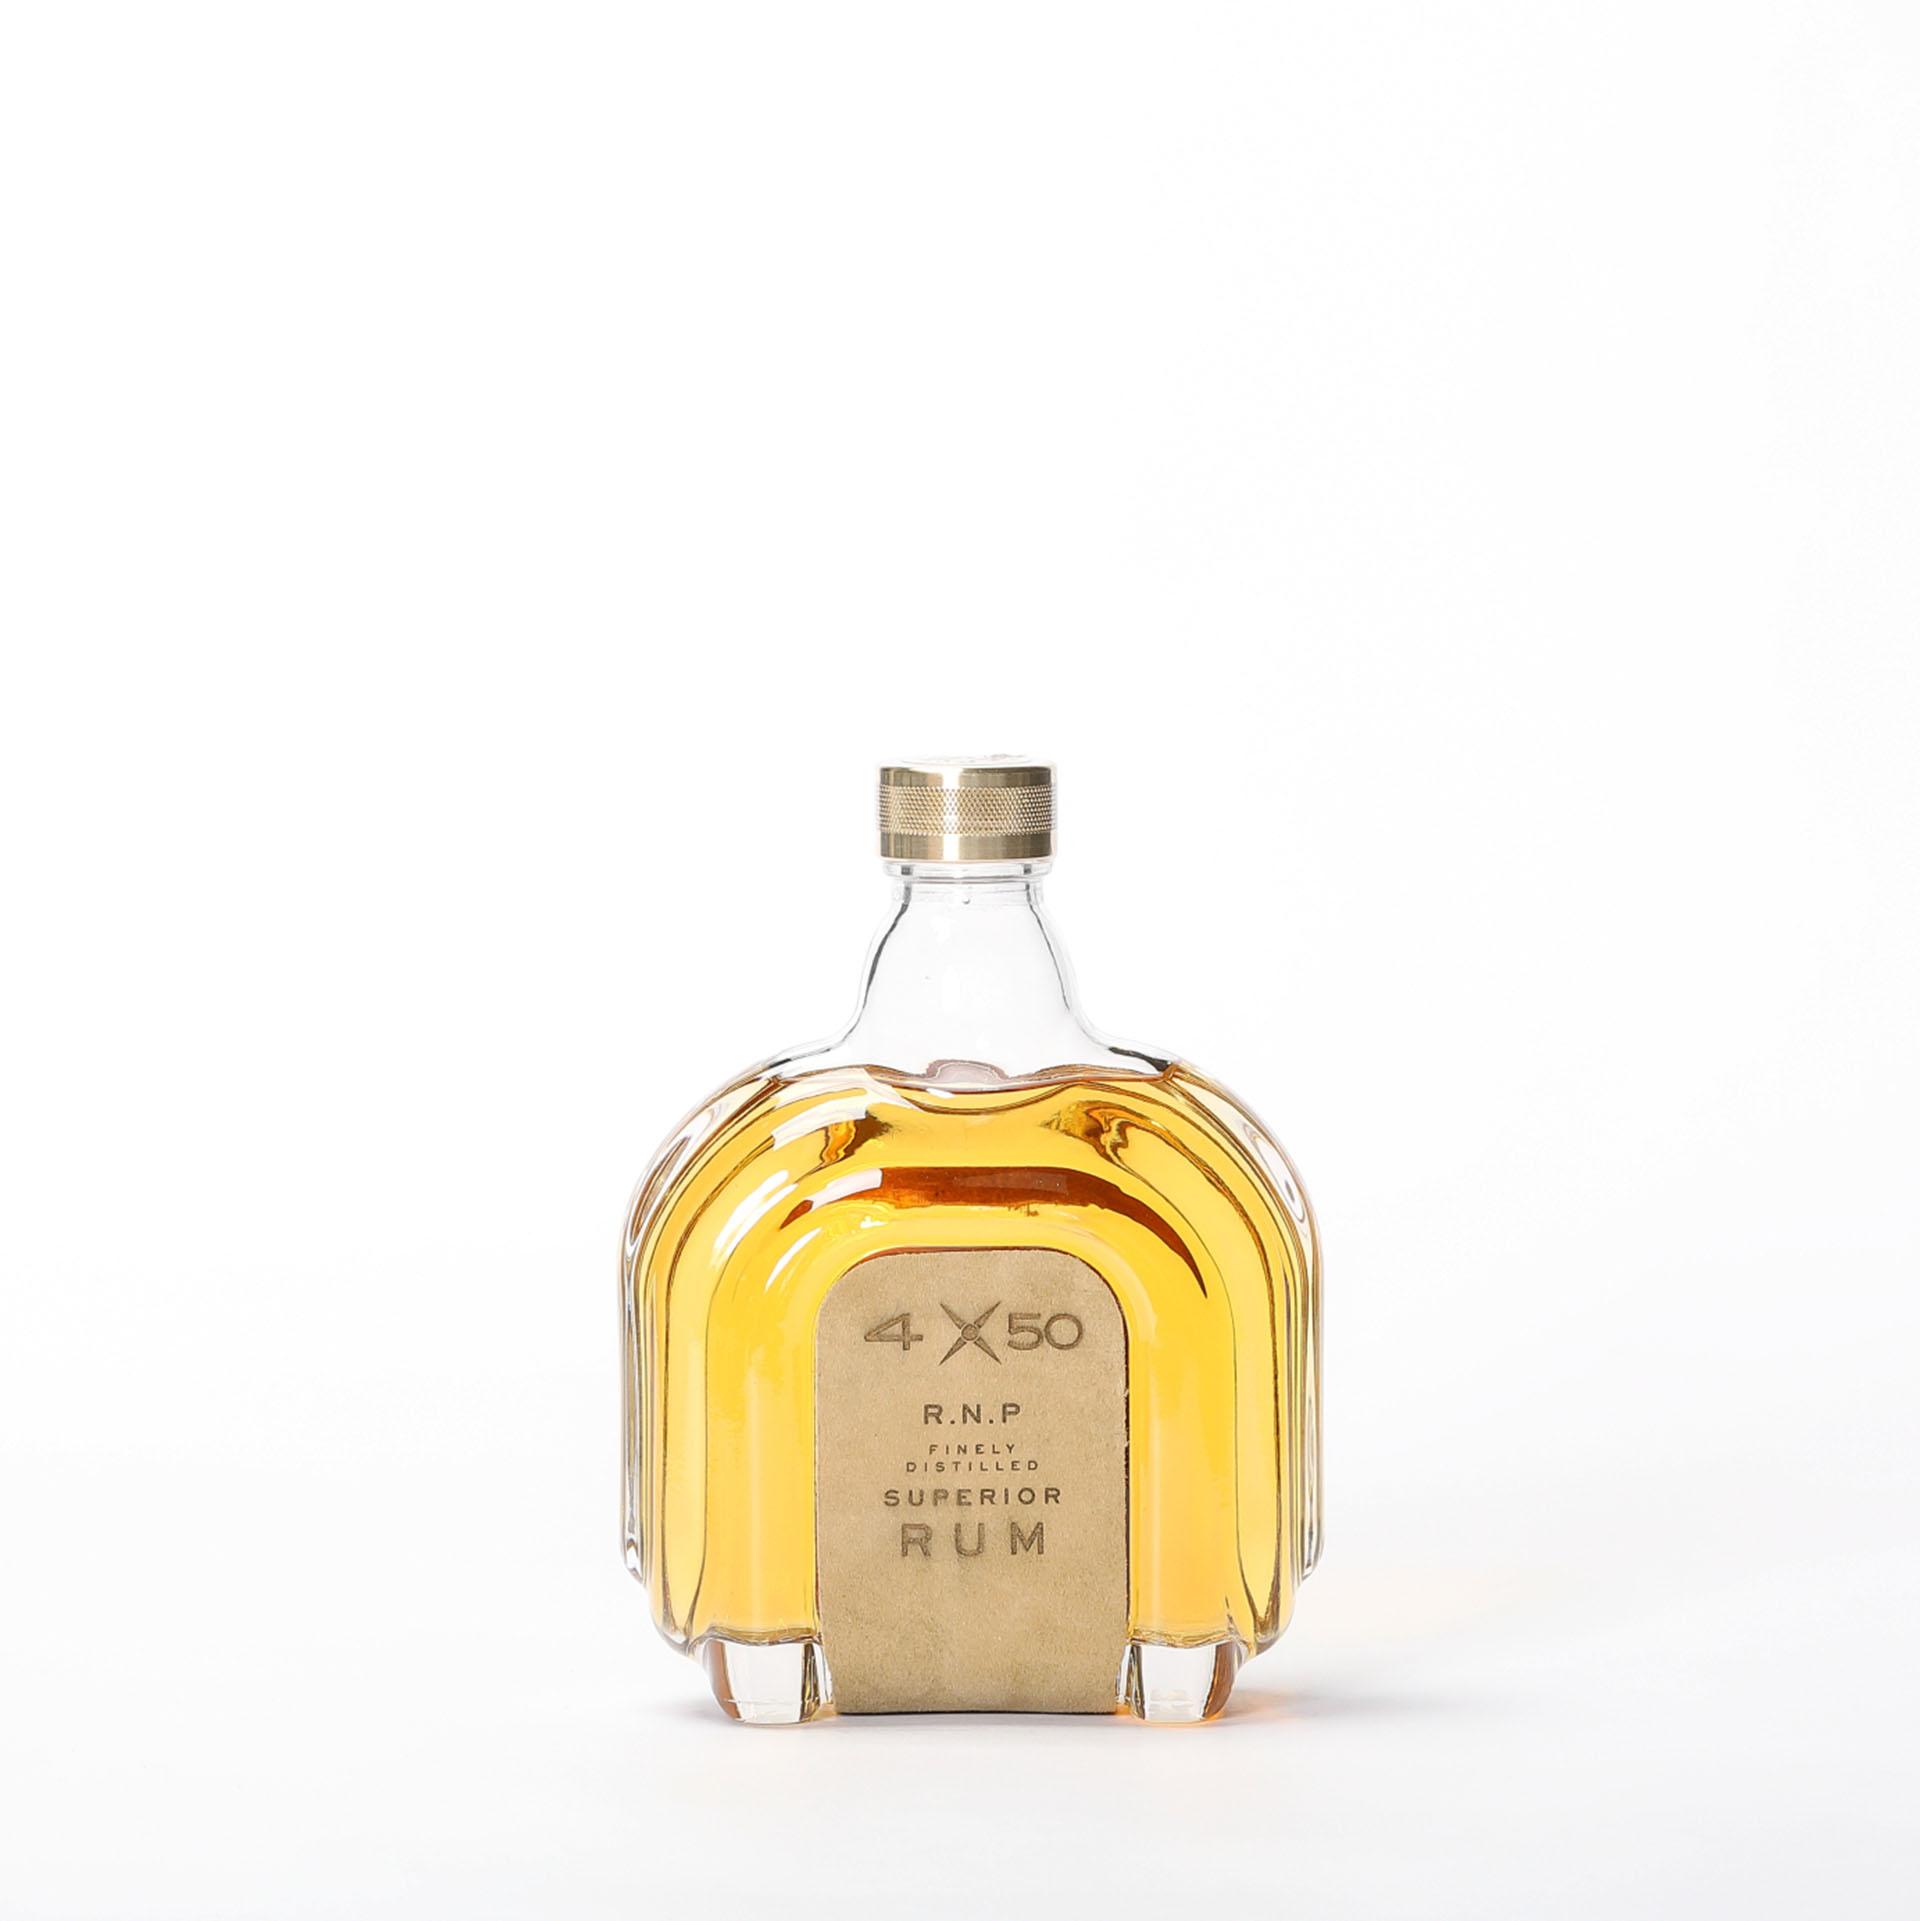 Produktbild Rum 4x50 R.N.P. - Reisetbauer Qualitätsbrand  DINZLER Kaffeerösterei